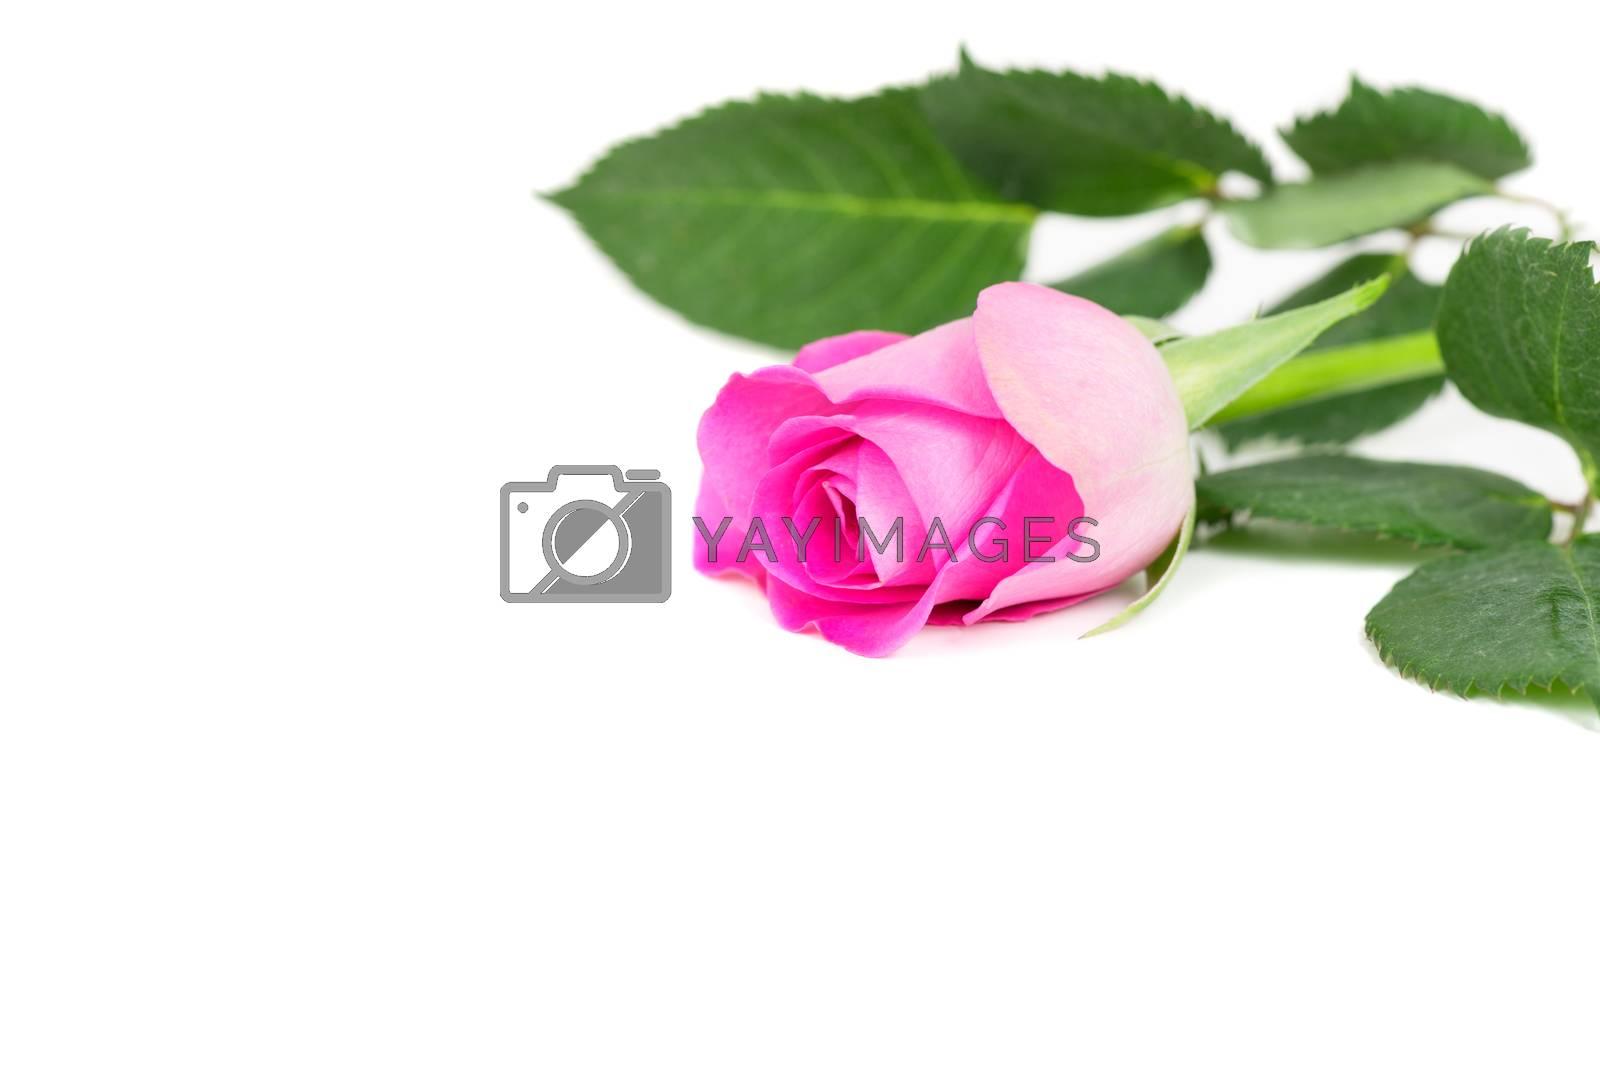 Pink rose isolated on white by Nanisimova